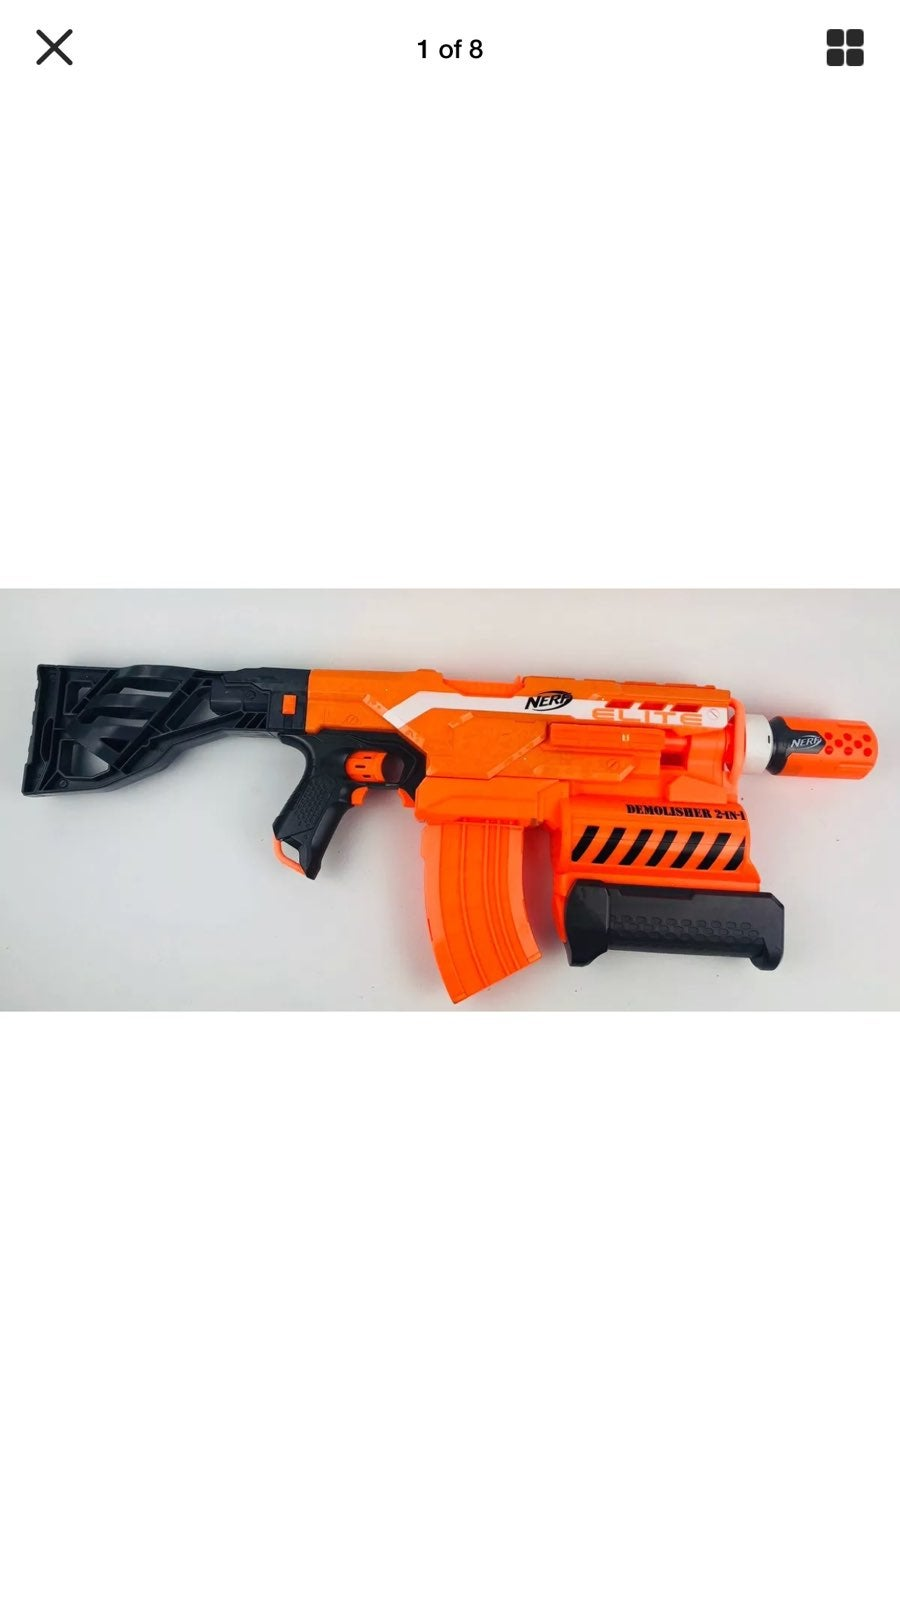 Nerf Demolisher 2-in-1 Dart Blaster